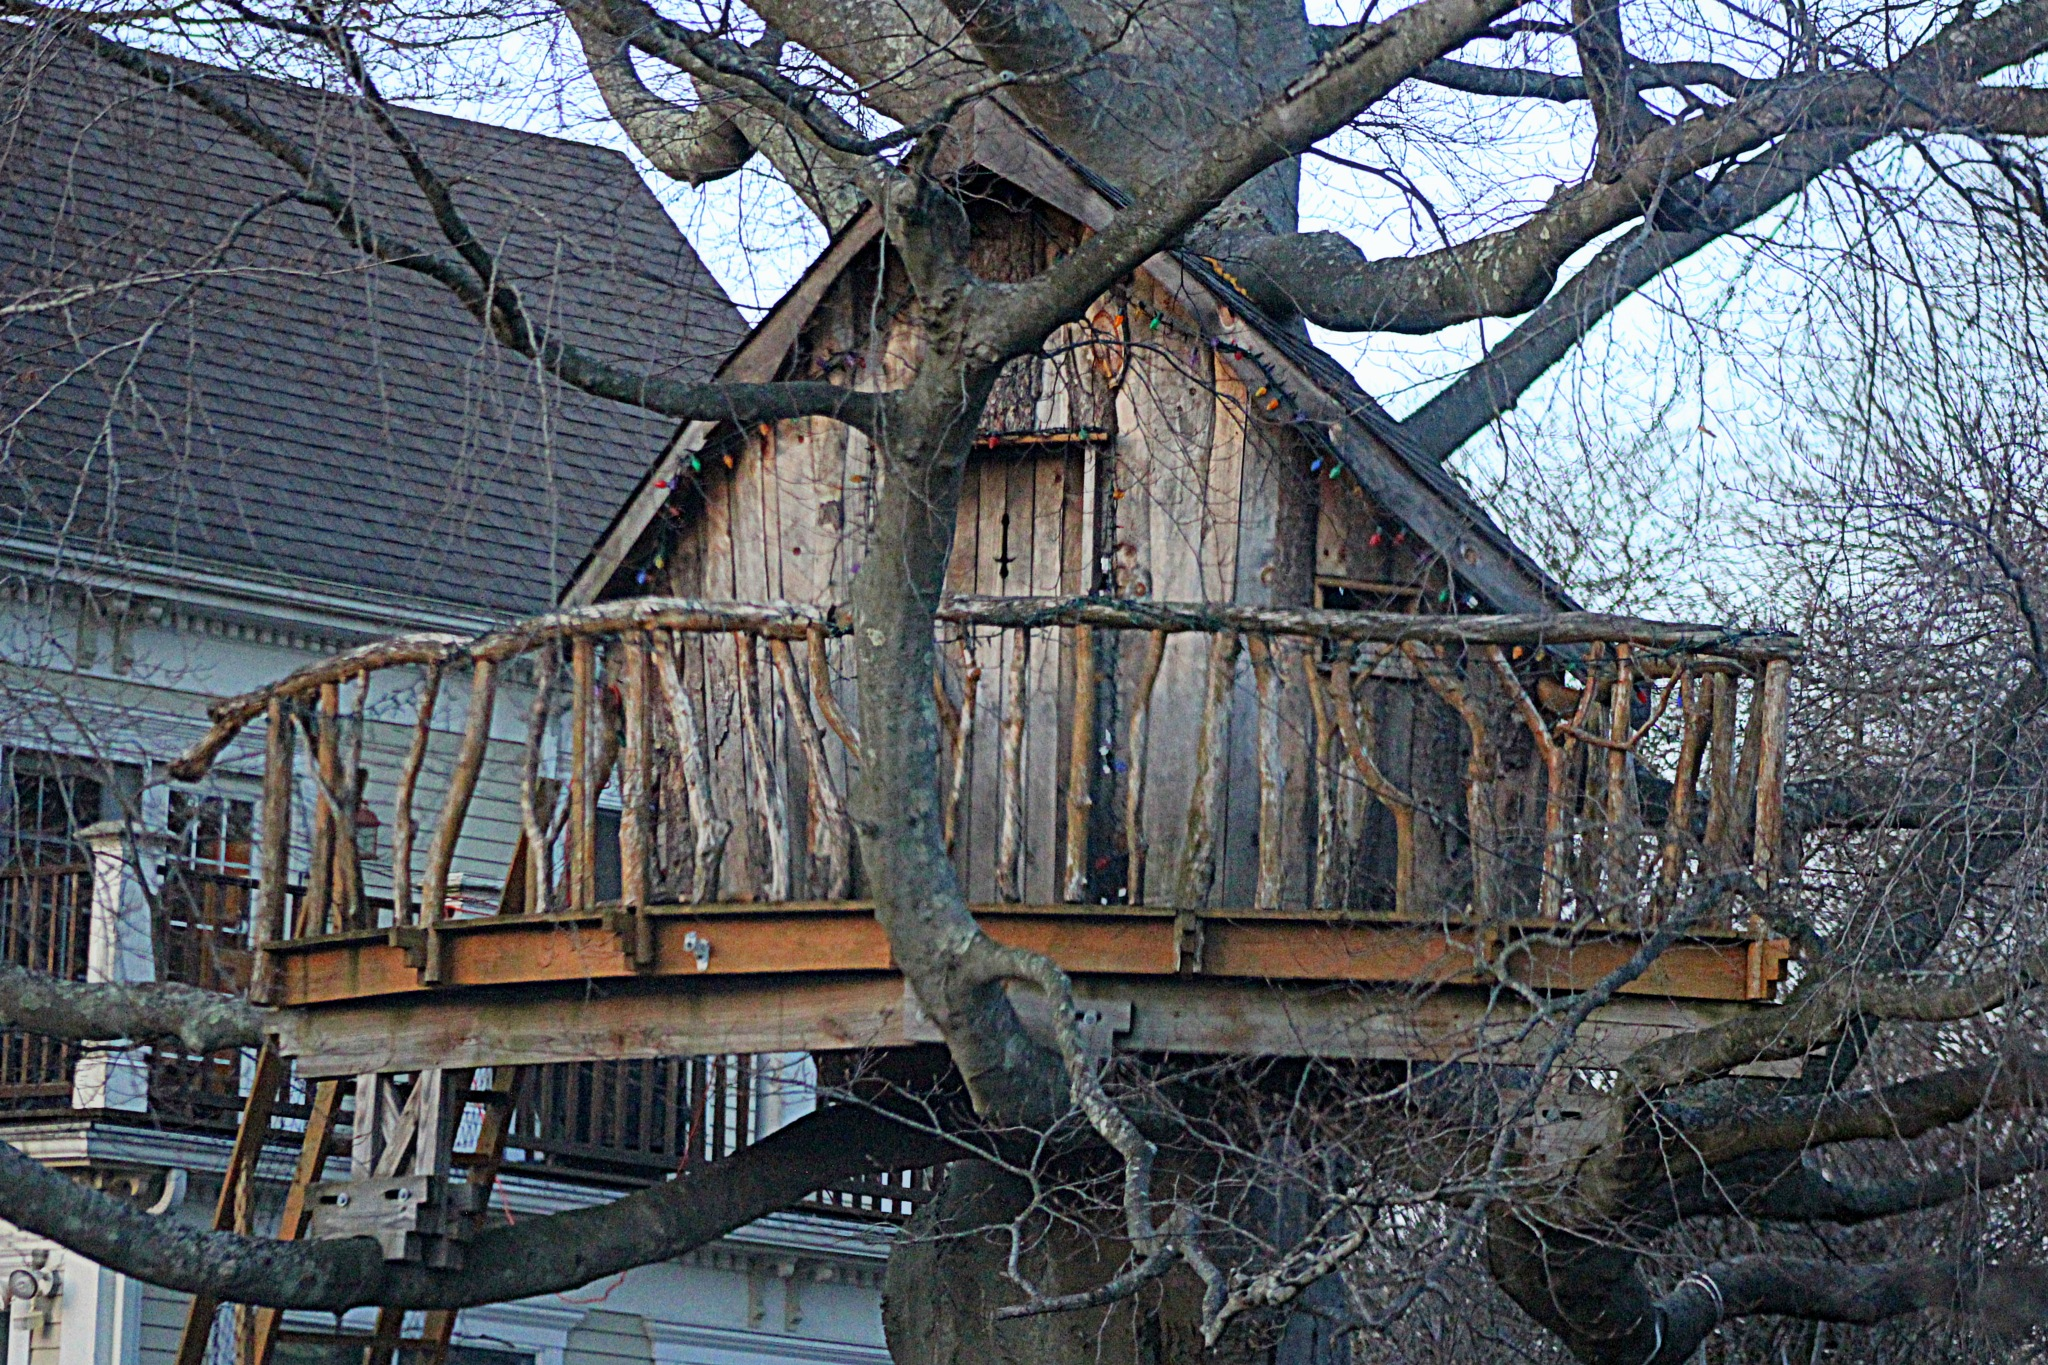 Tree House by susanne carlton